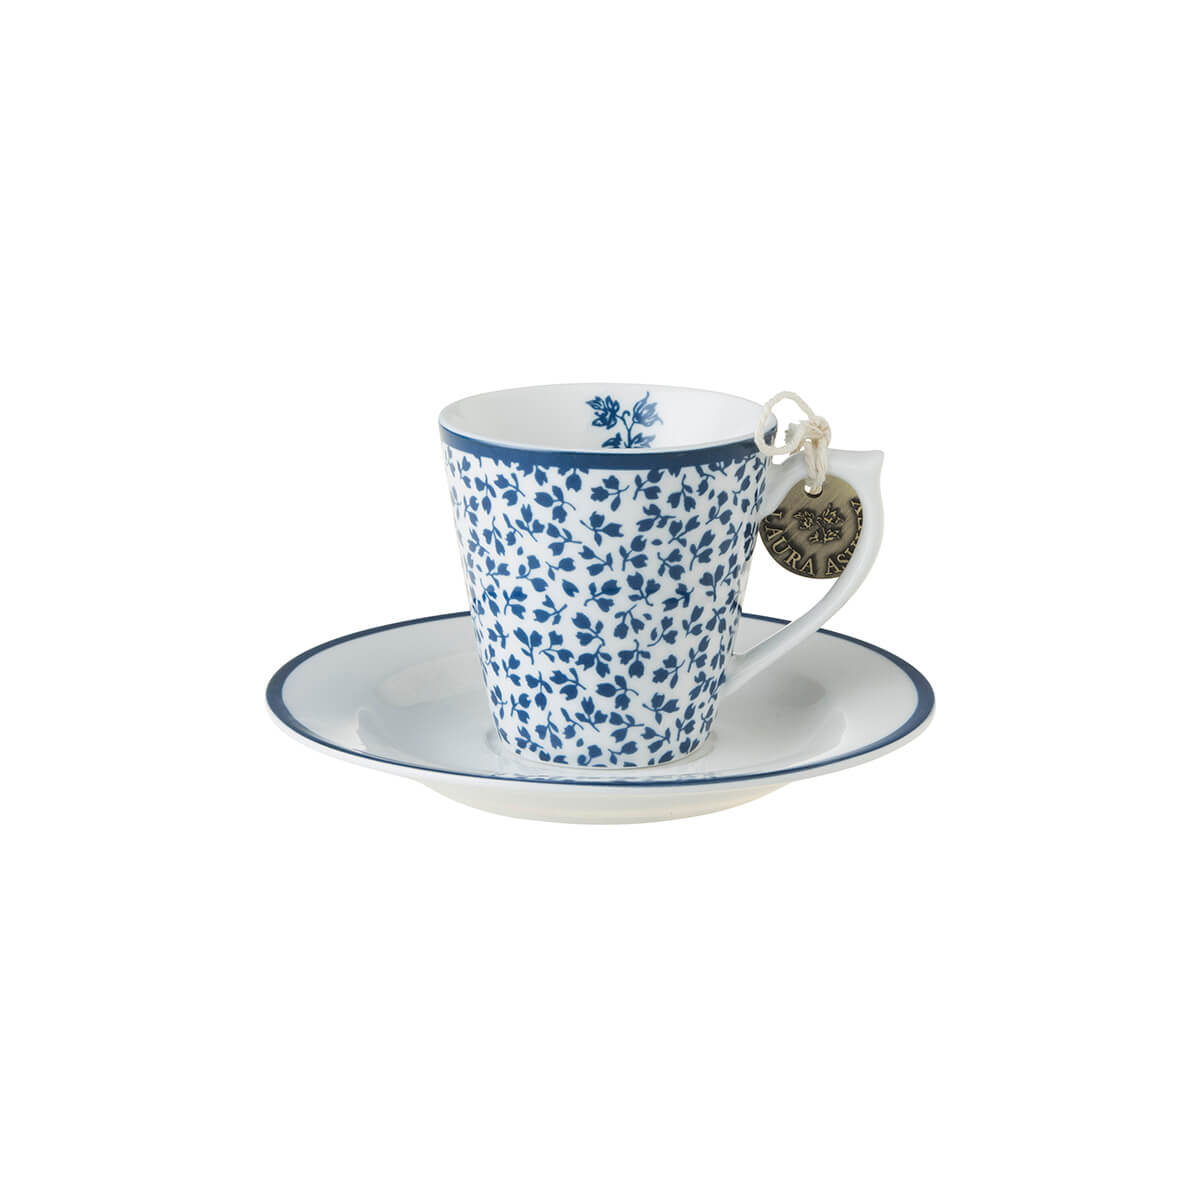 Онлайн каталог PROMENU: Набор: чашка с блюдцем эспрессо Laura Ashley BLUEPRINT, белый в синий мелкий цветок Laura Ashley 178693